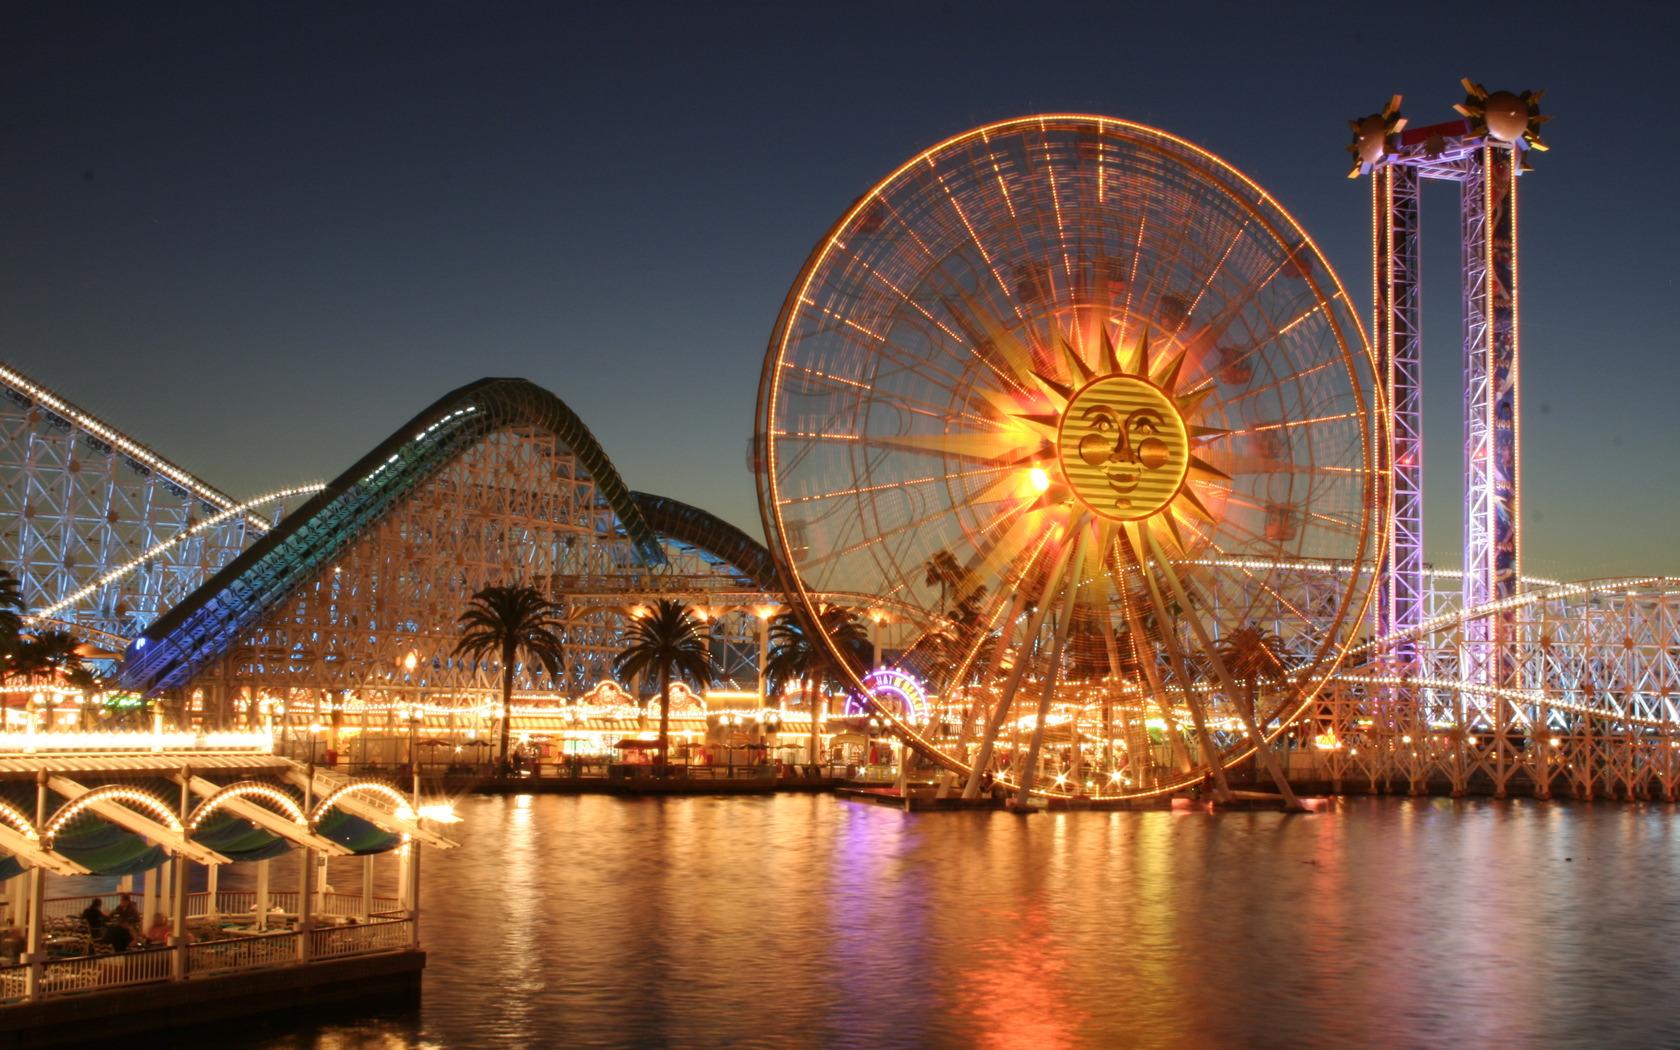 Ferris wheel by brunofiorani